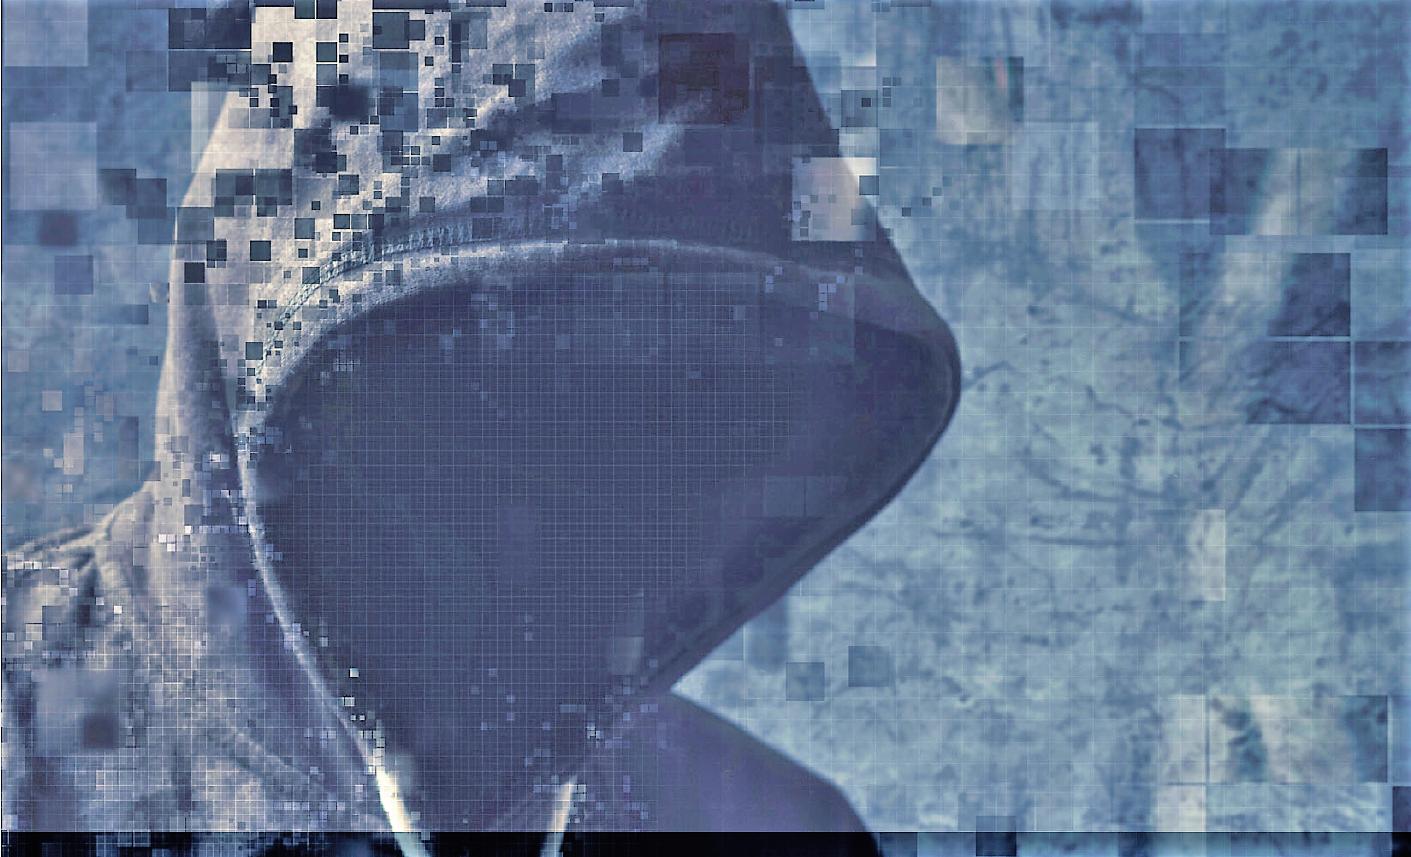 Scoperta la botnet Hide&Seek che attacca l'IoT